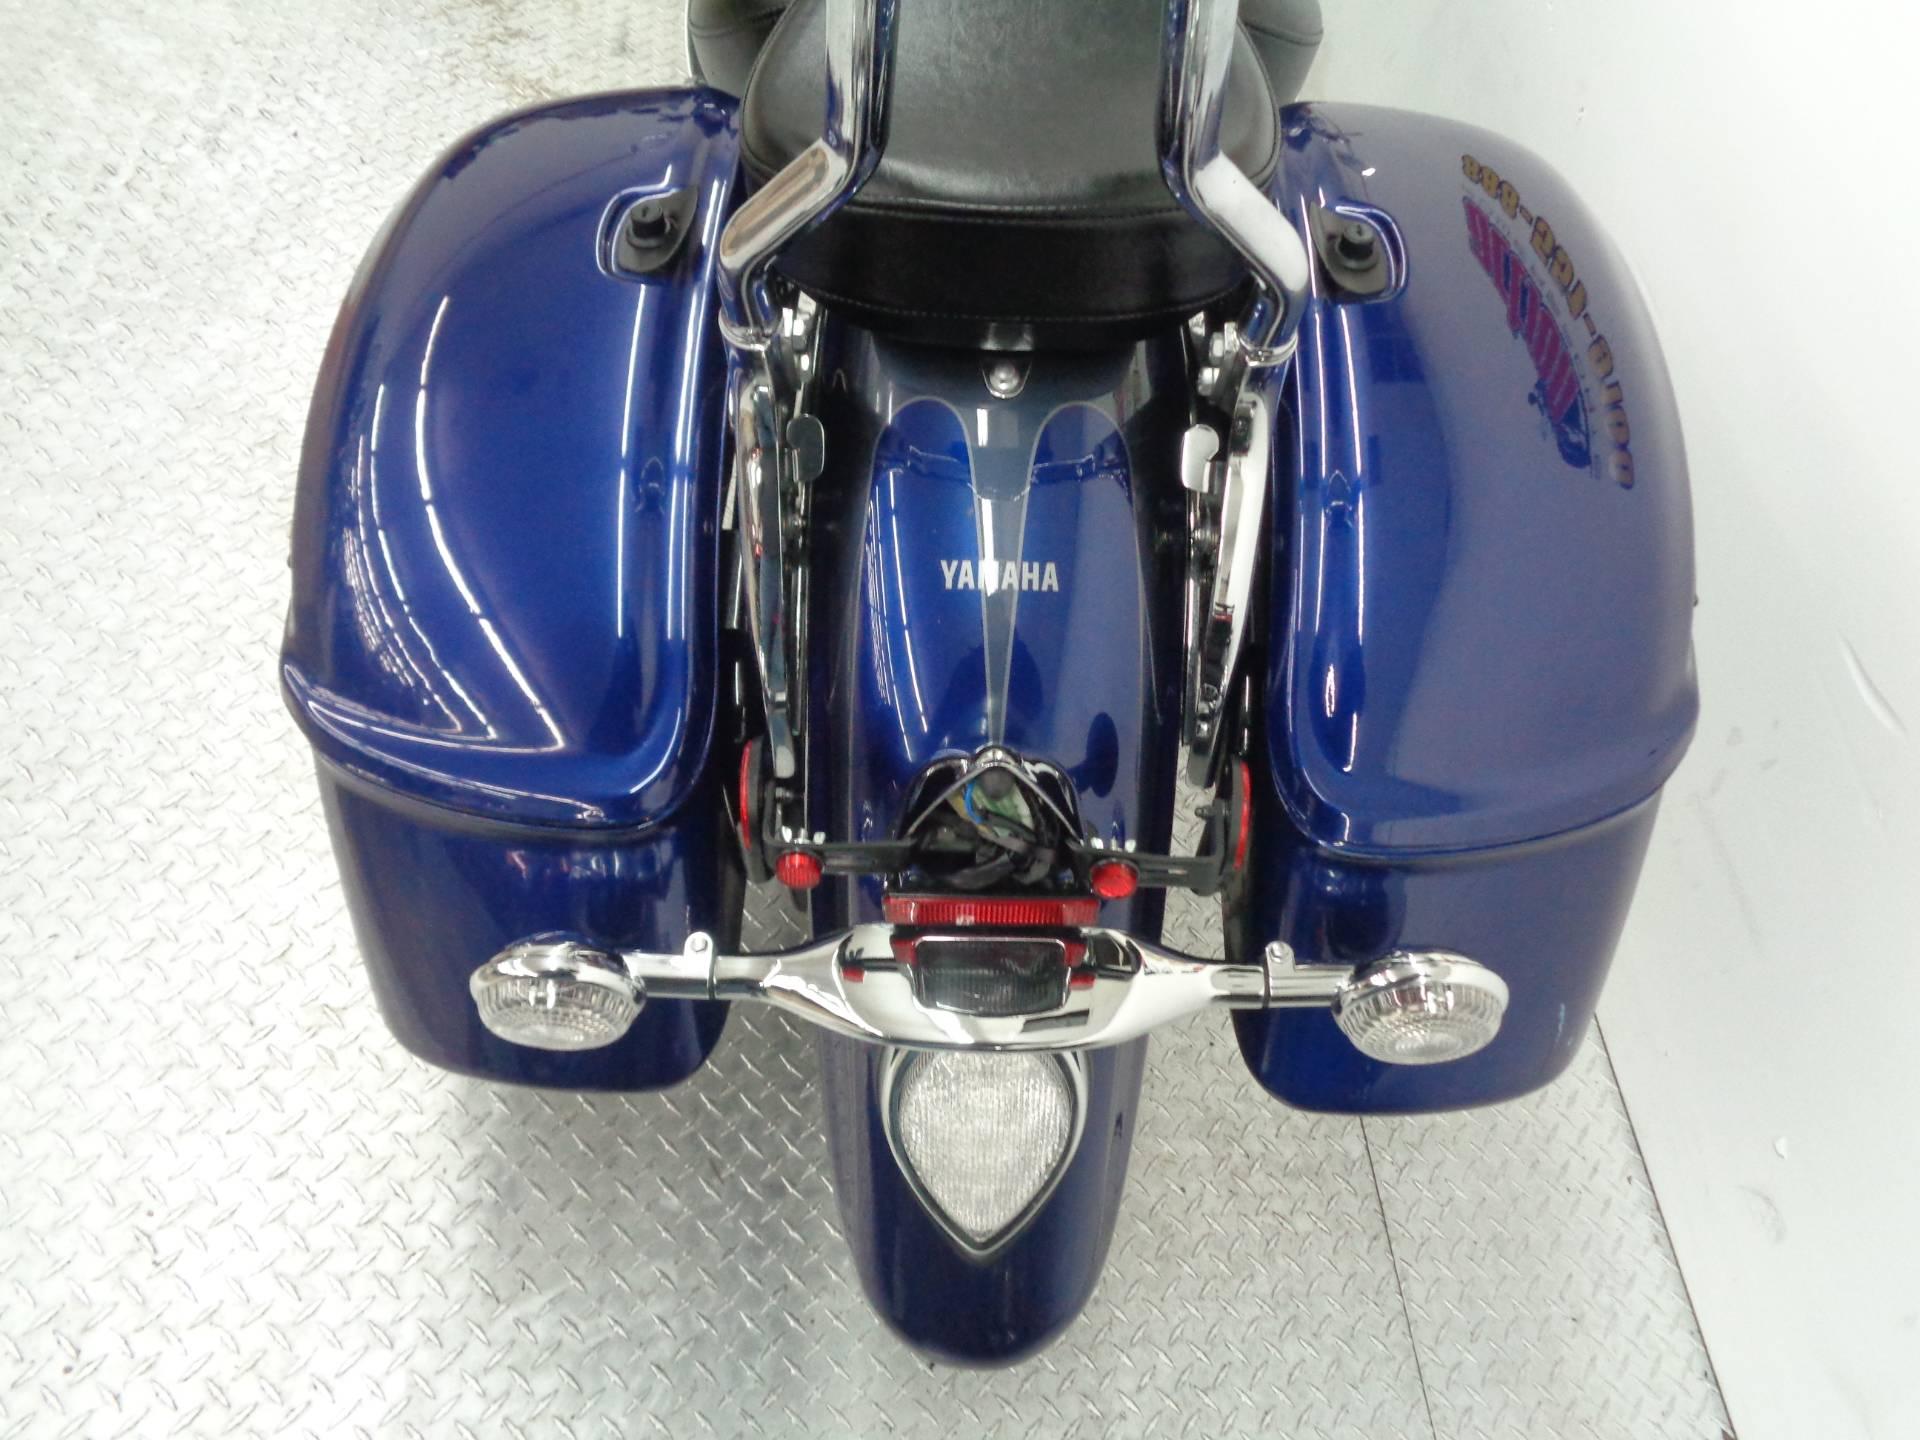 2008 Yamaha Road Star 3